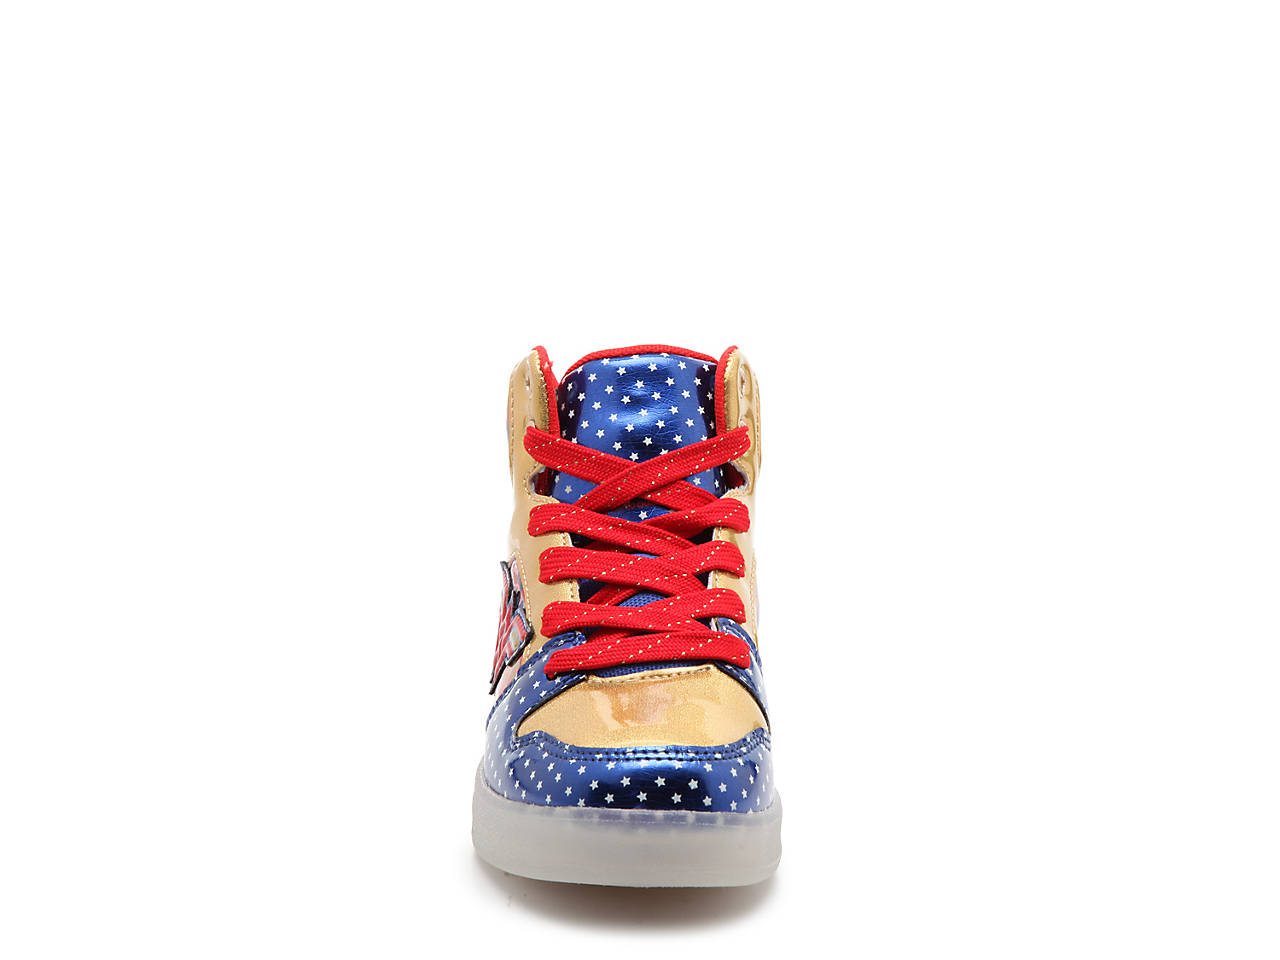 6027342a6de5 Warner Bros Wonder Woman Youth Light-Up High-Top Sneaker Kids Shoes ...